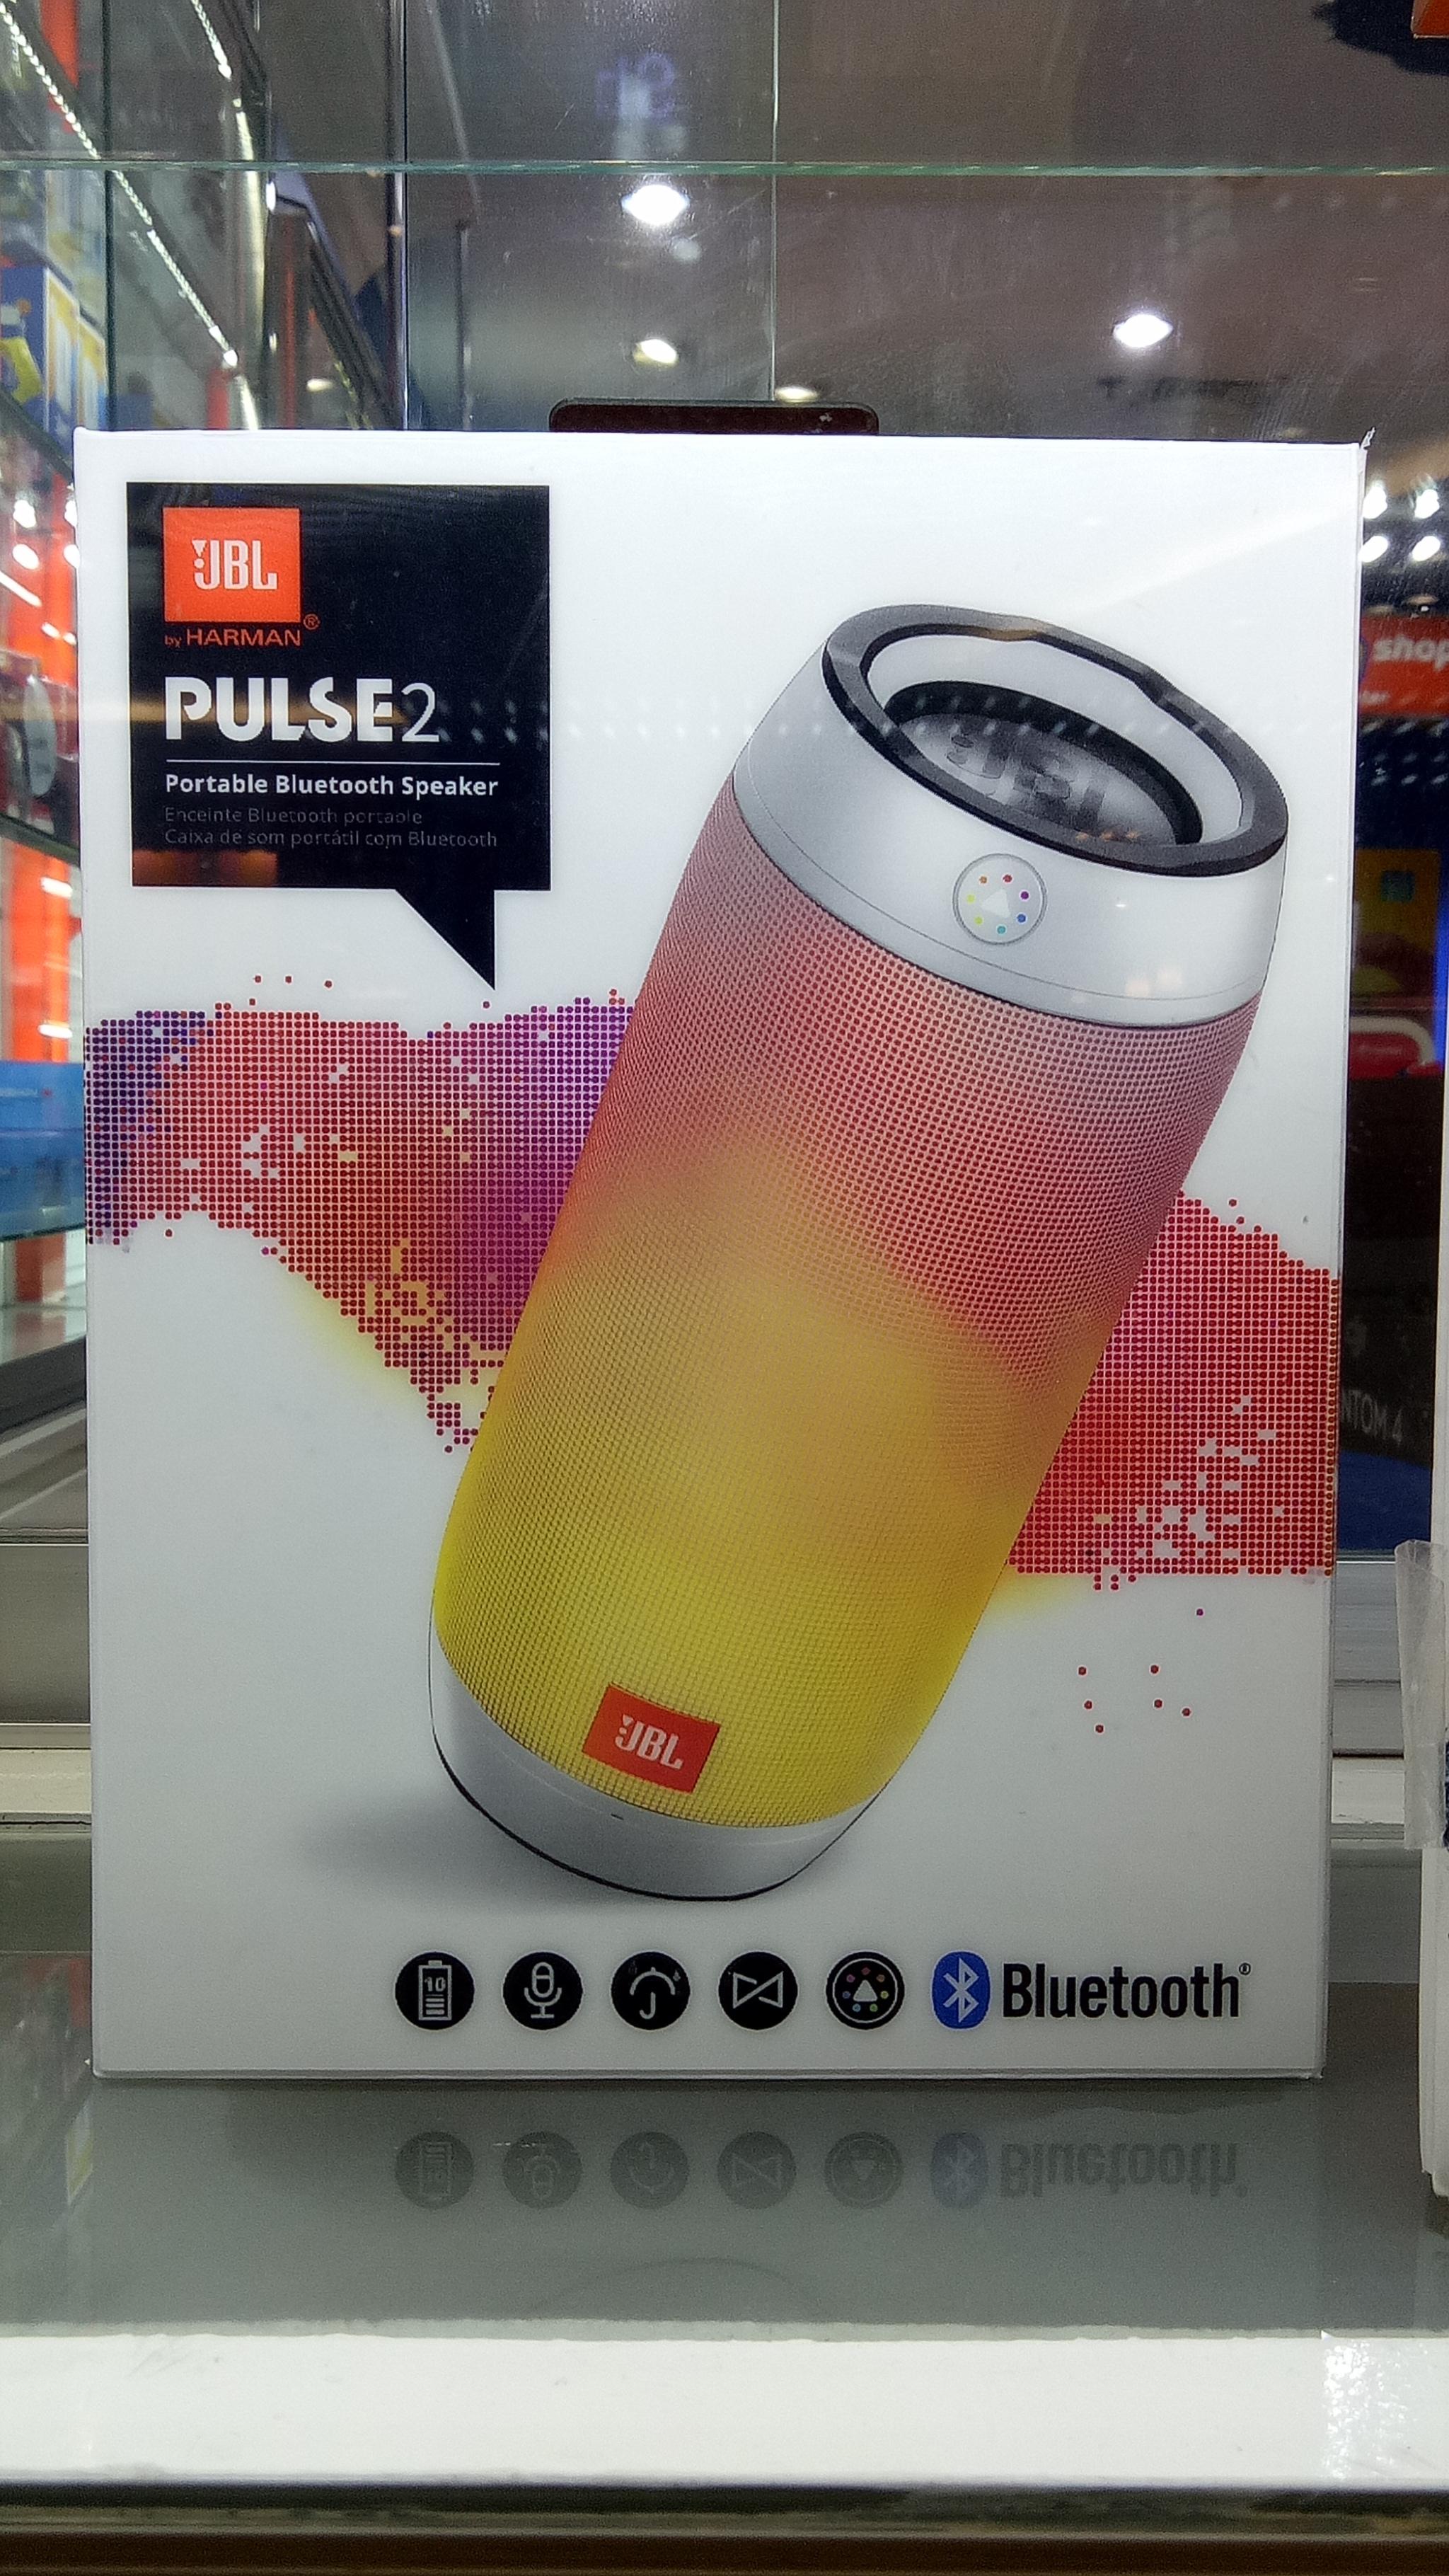 Jual Jbl Portable Bluetooth Speaker Pulse 2 Majid